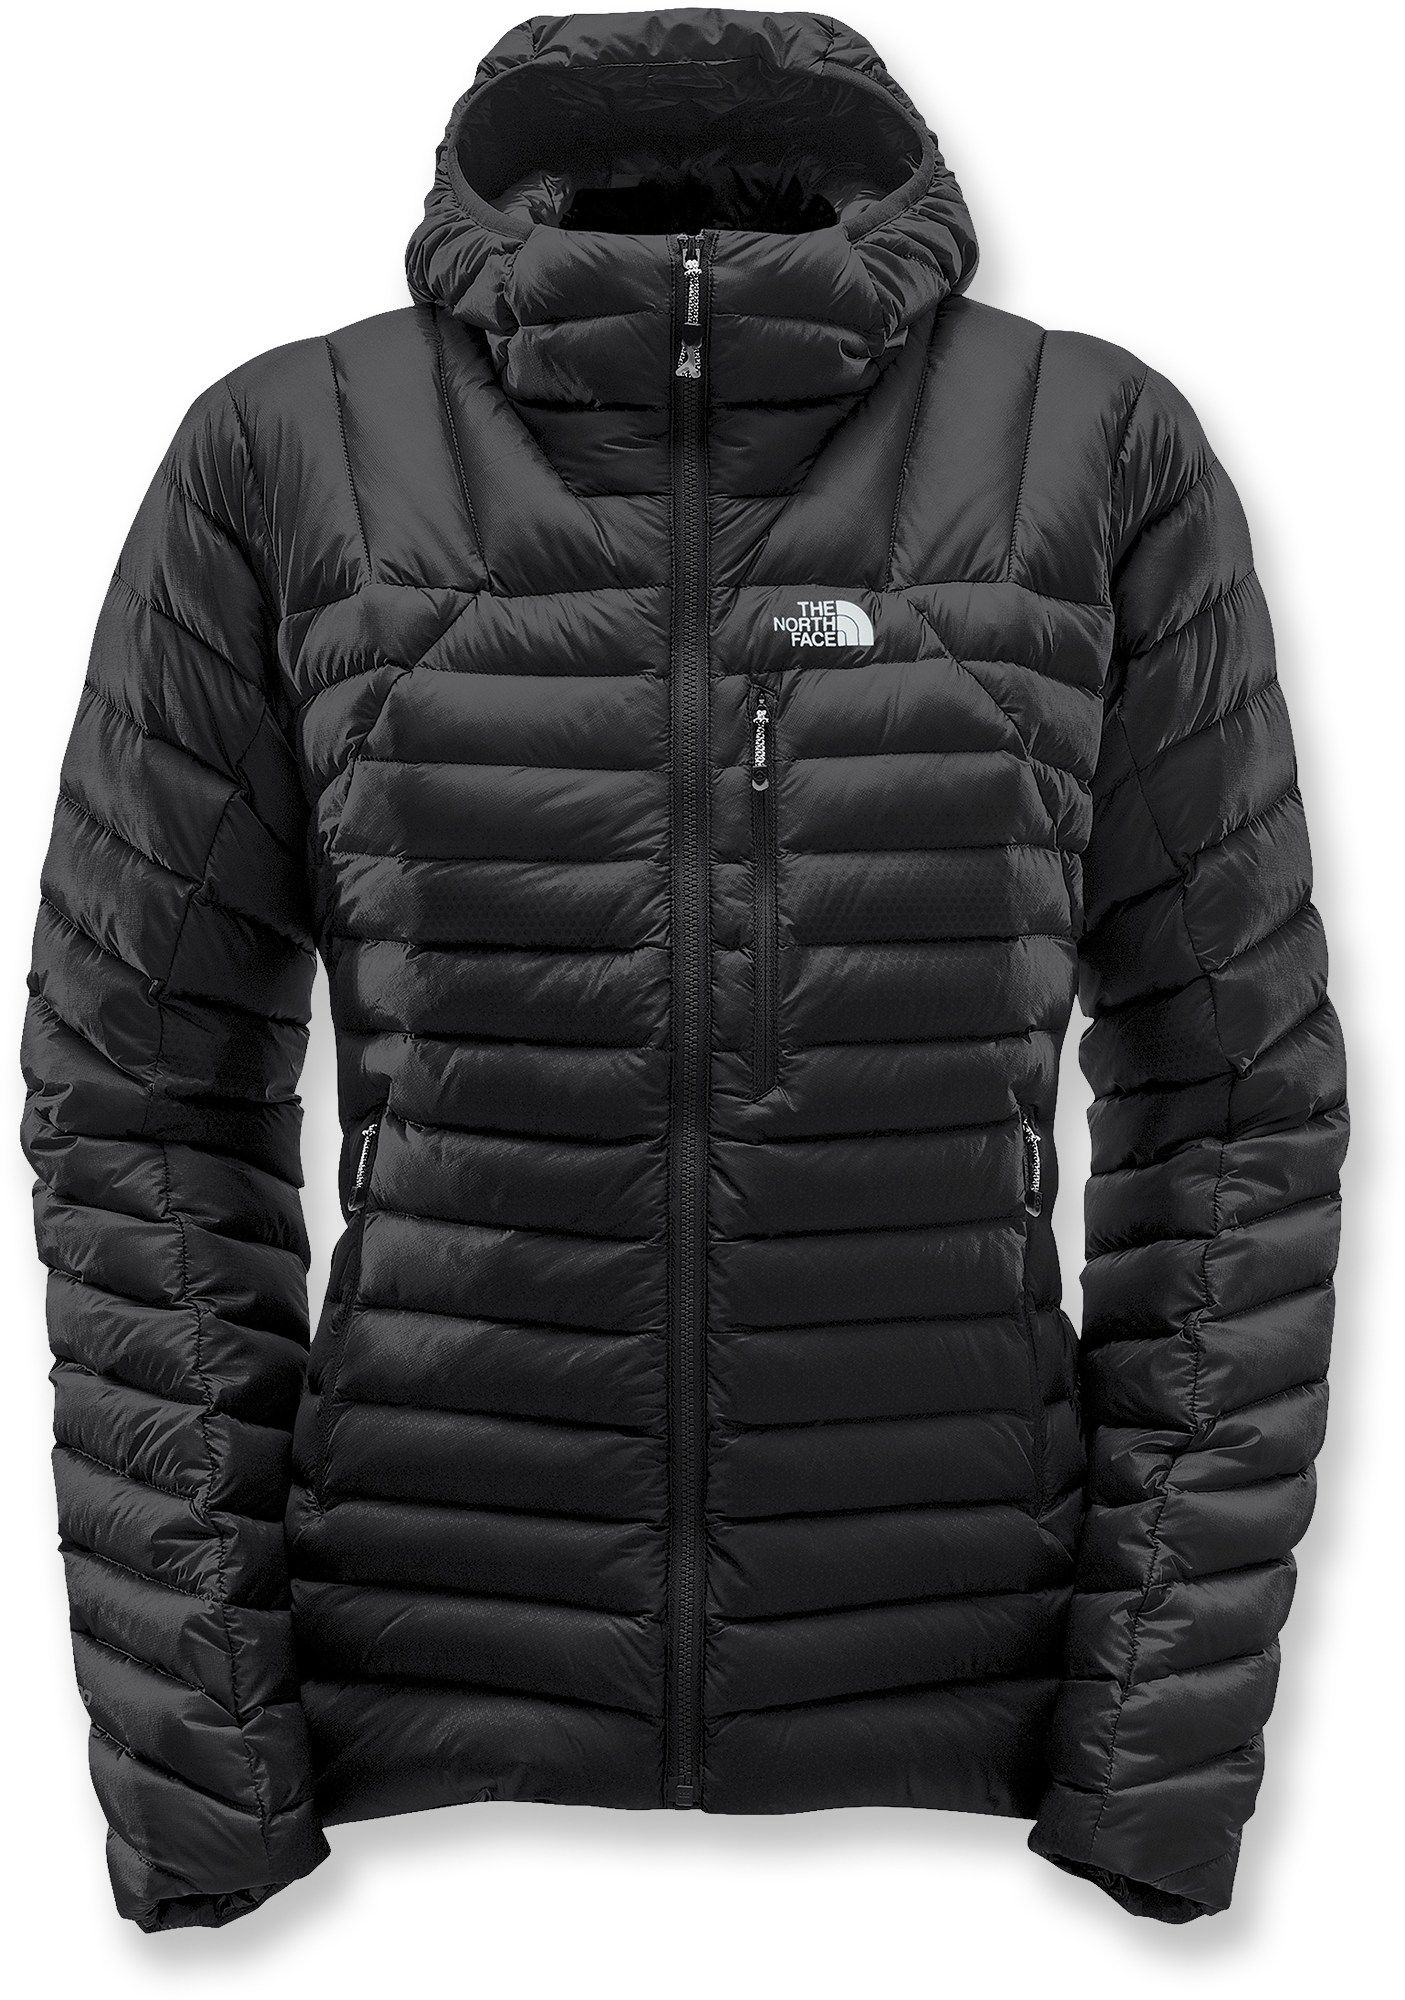 e6233dc04 Summit L3 Down Jacket - Women's | *Apparel & Accessories* | Jackets ...